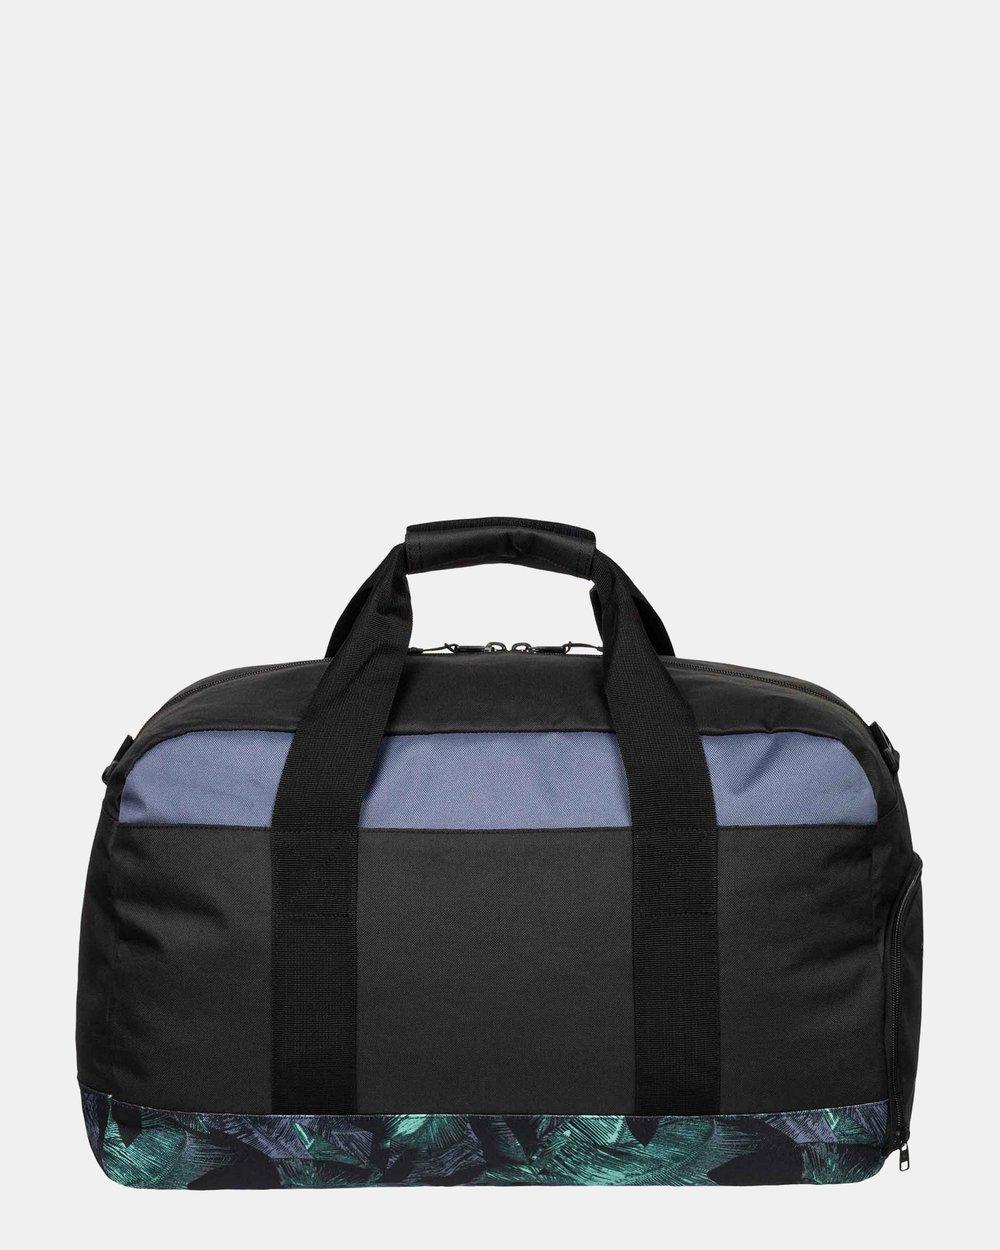 Mens Medium Shelter Duffle Bag by Quiksilver Online  c4a473e46344a